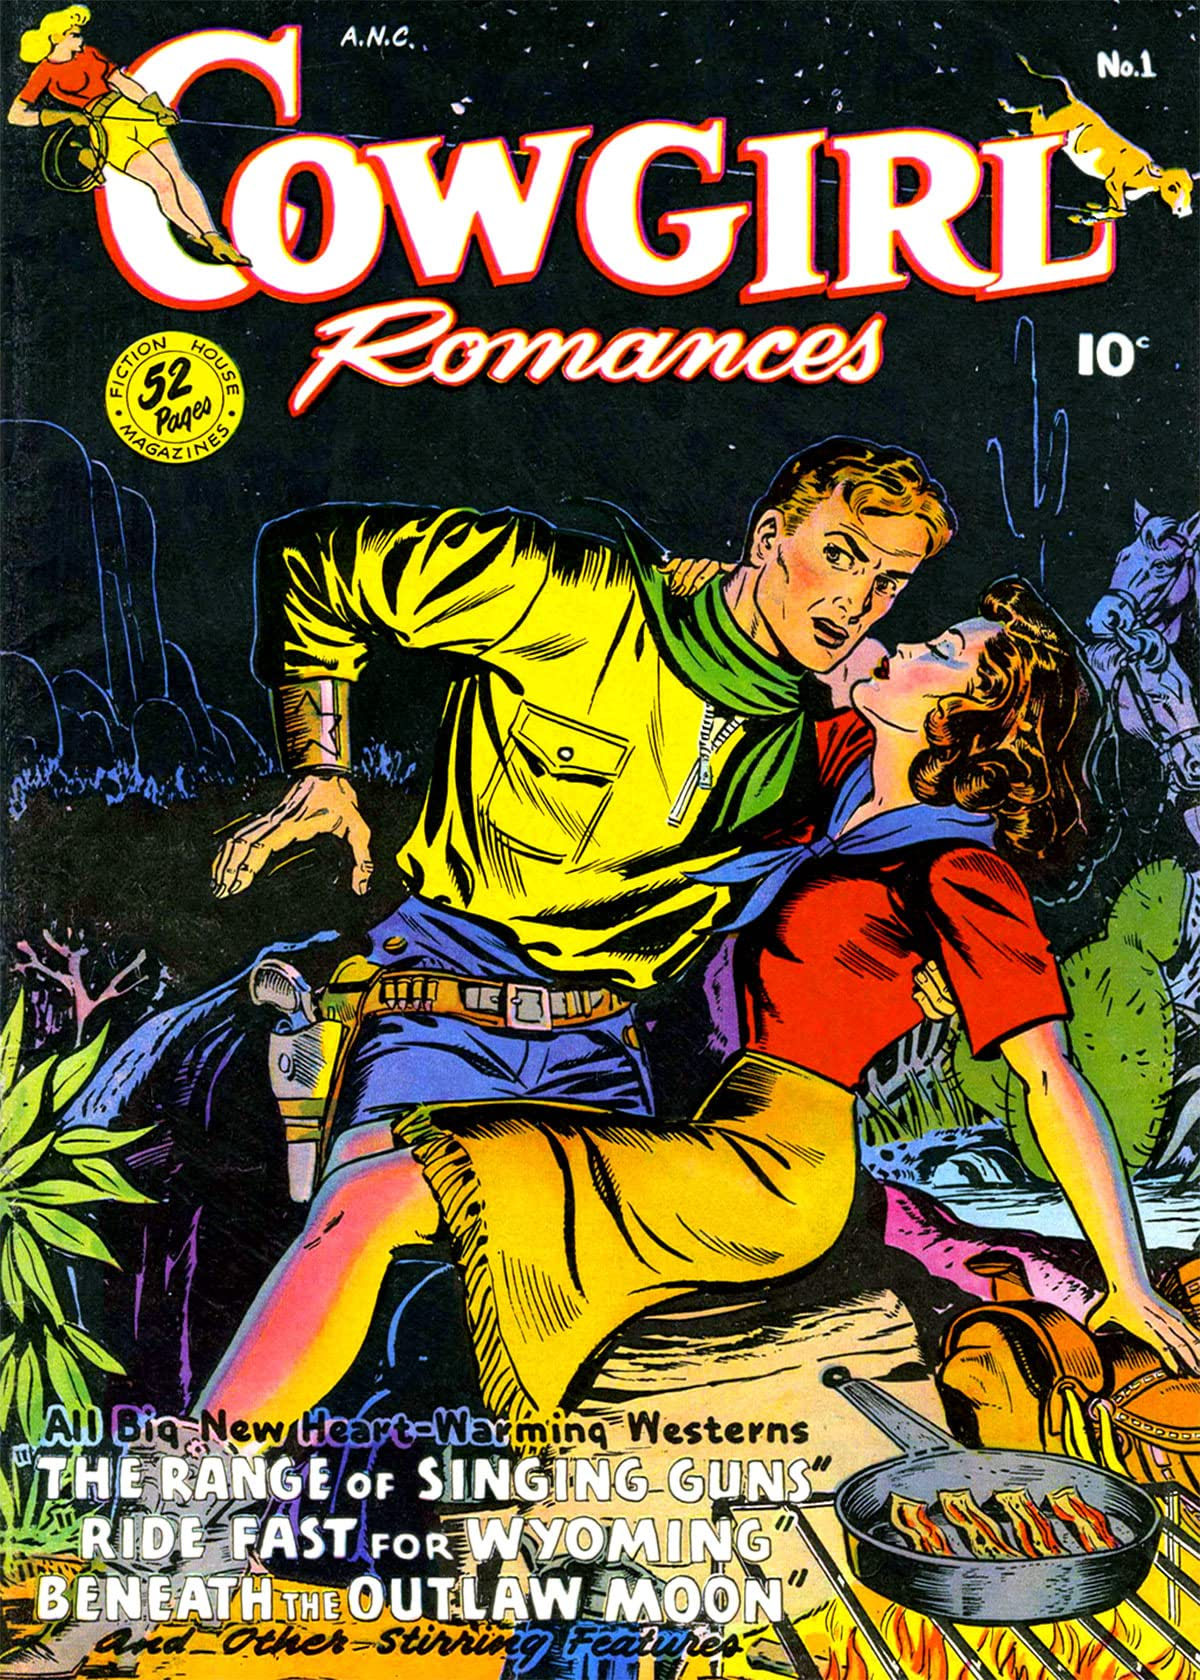 Cowgirl Romances #1